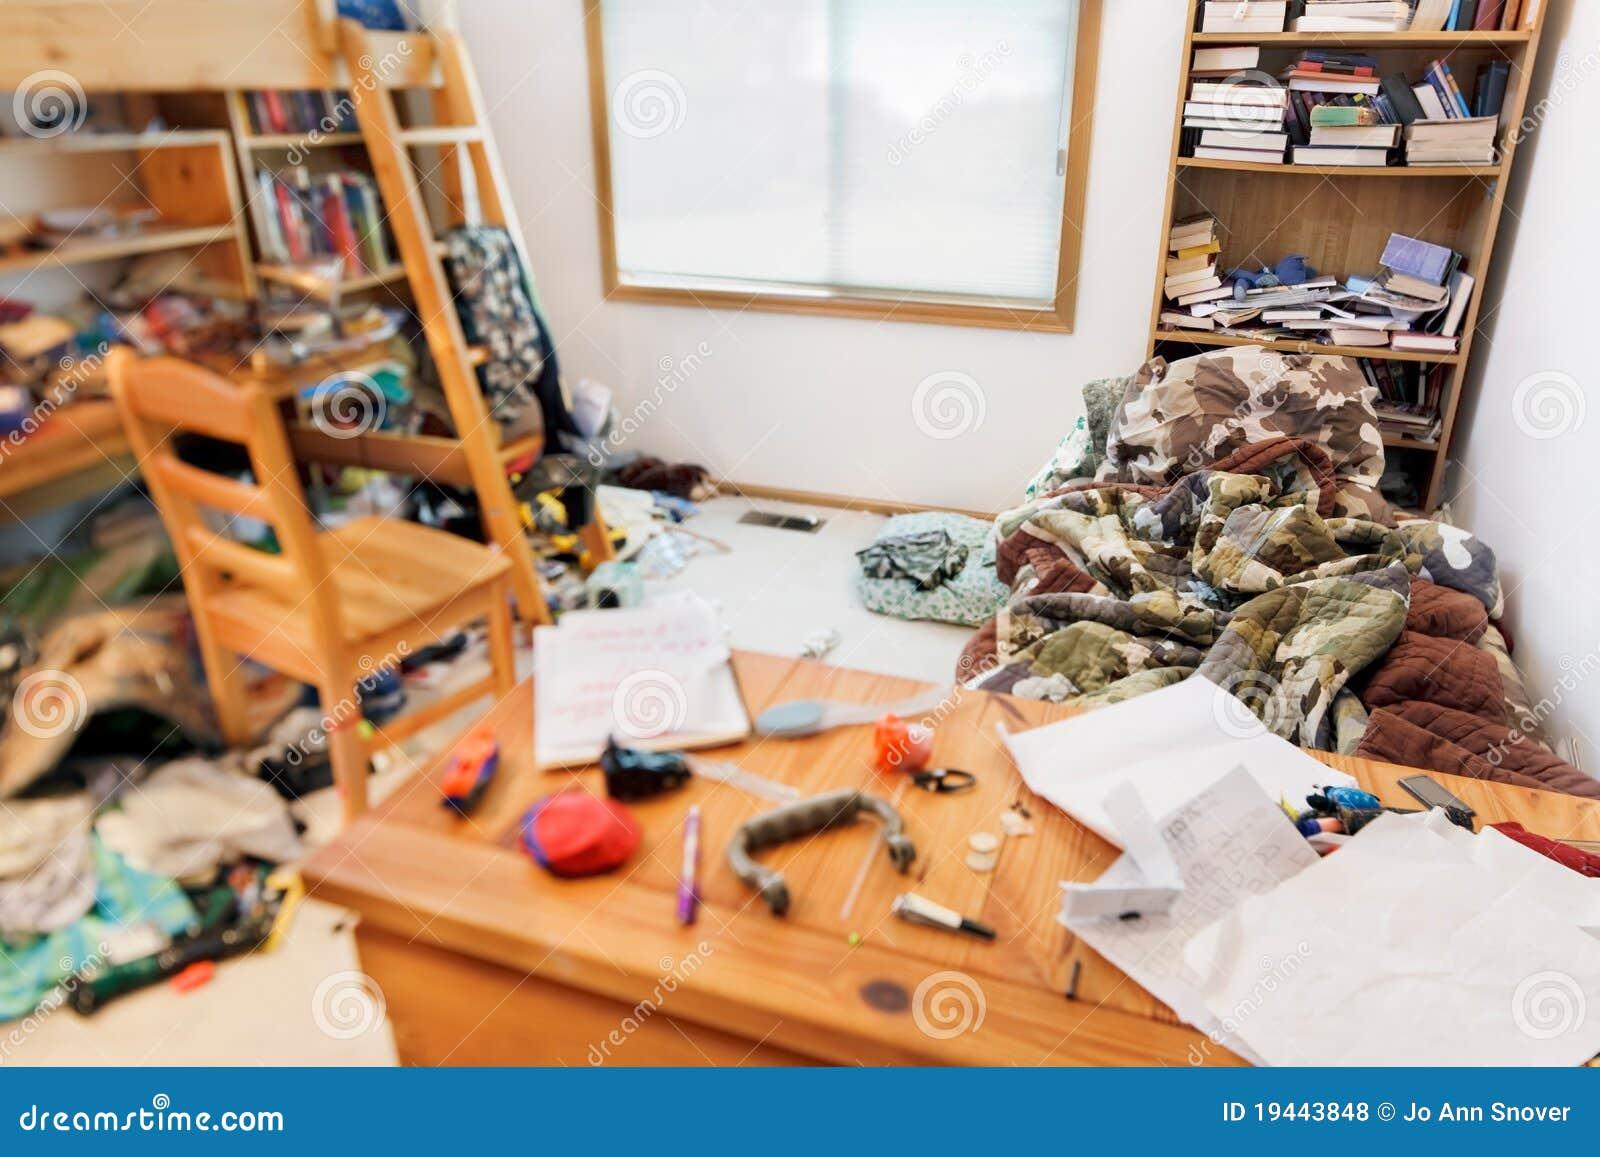 Teenagers messy room